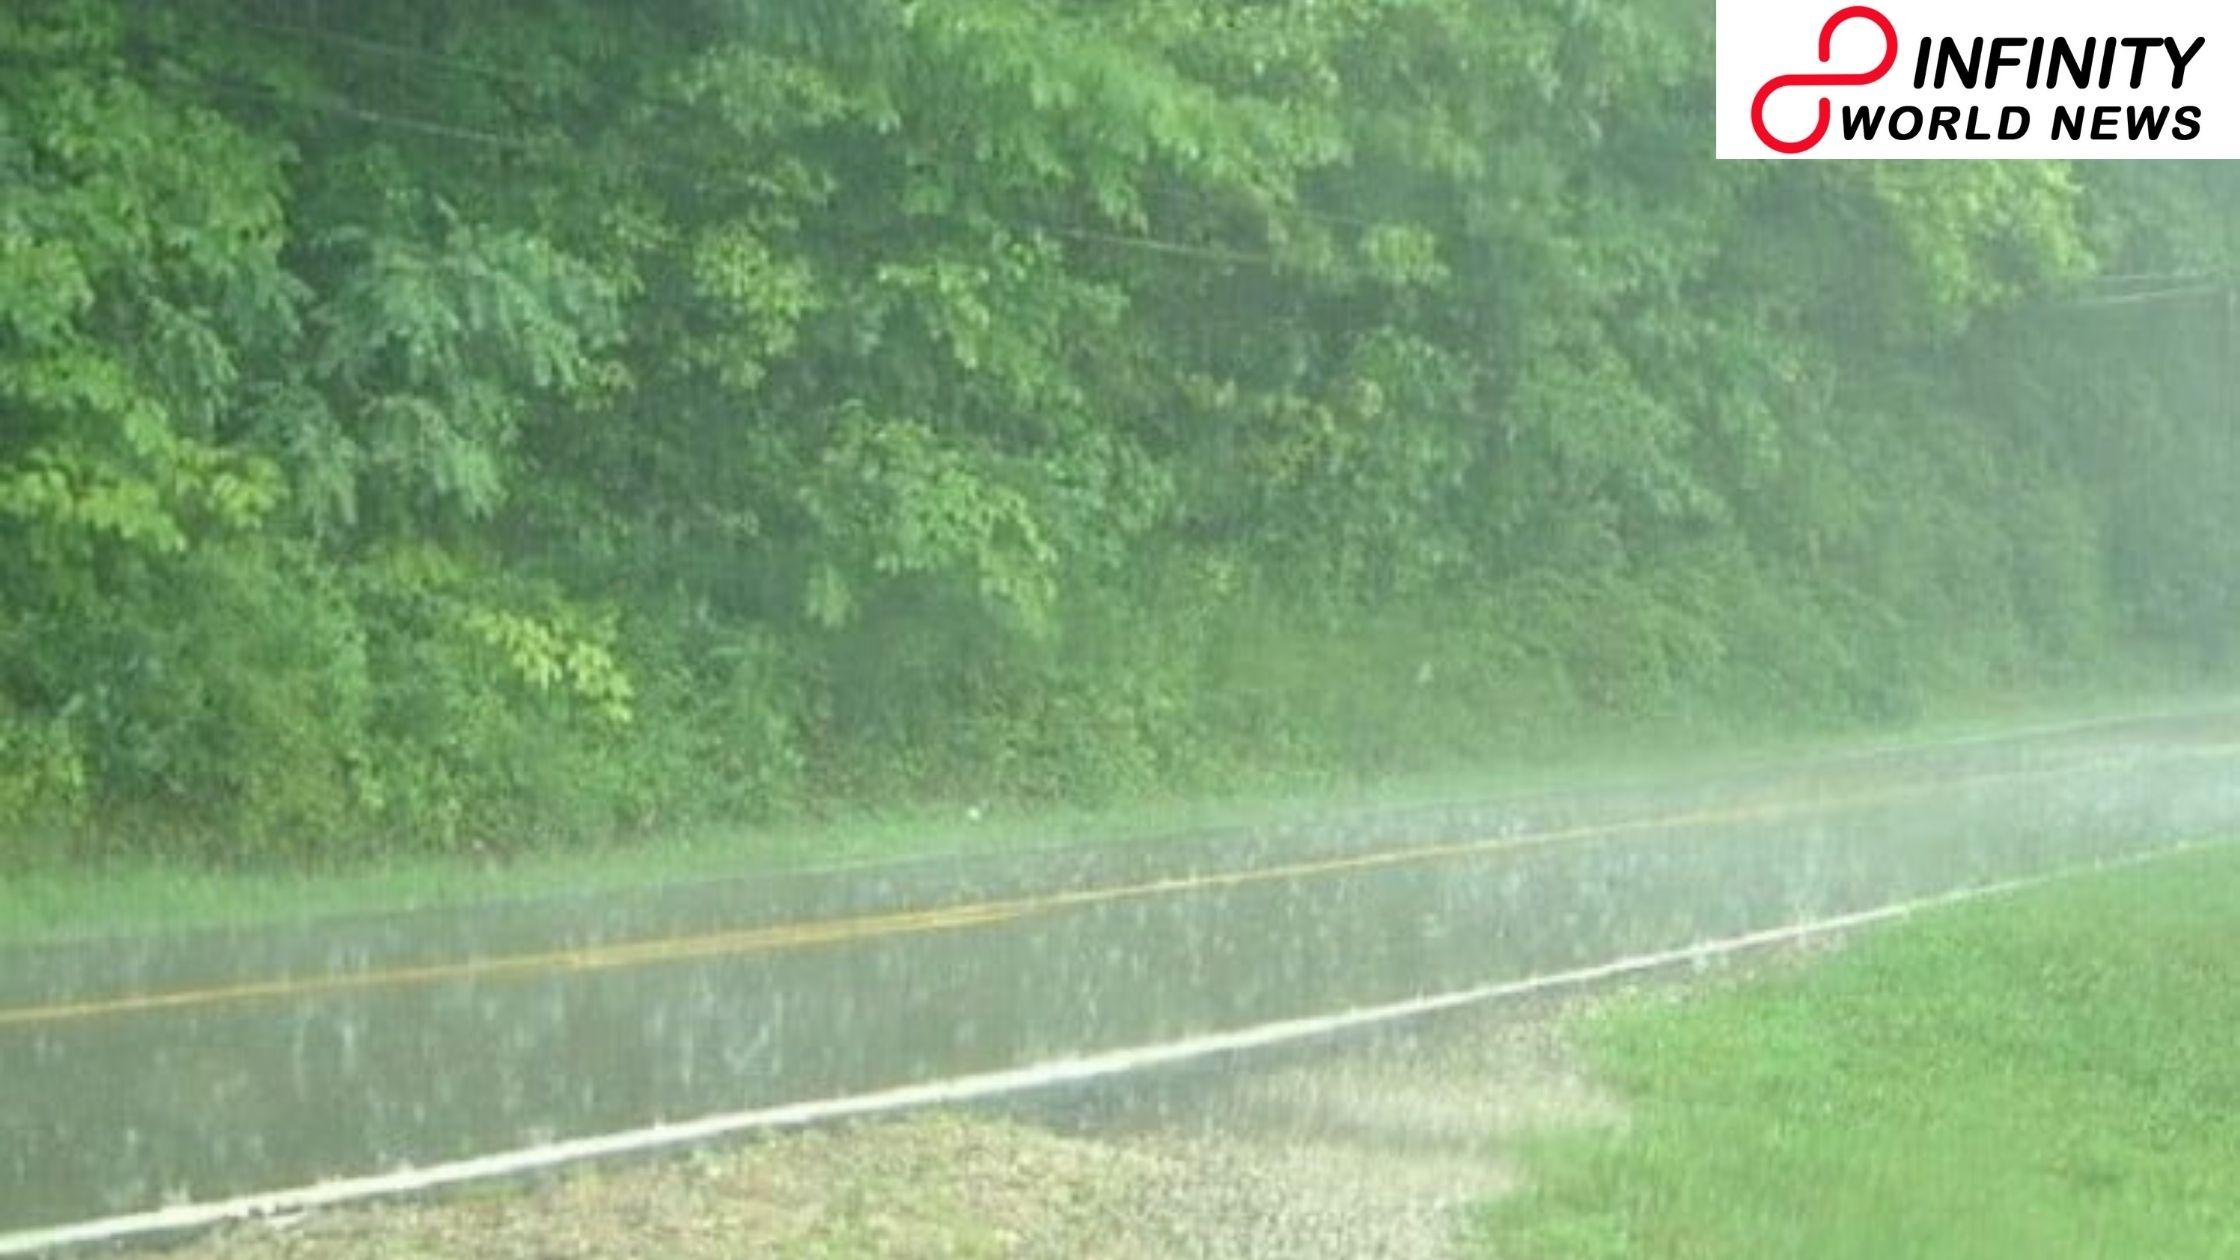 Substantial Rain Likely over Nagaland, Manipur, Tamil Nadu